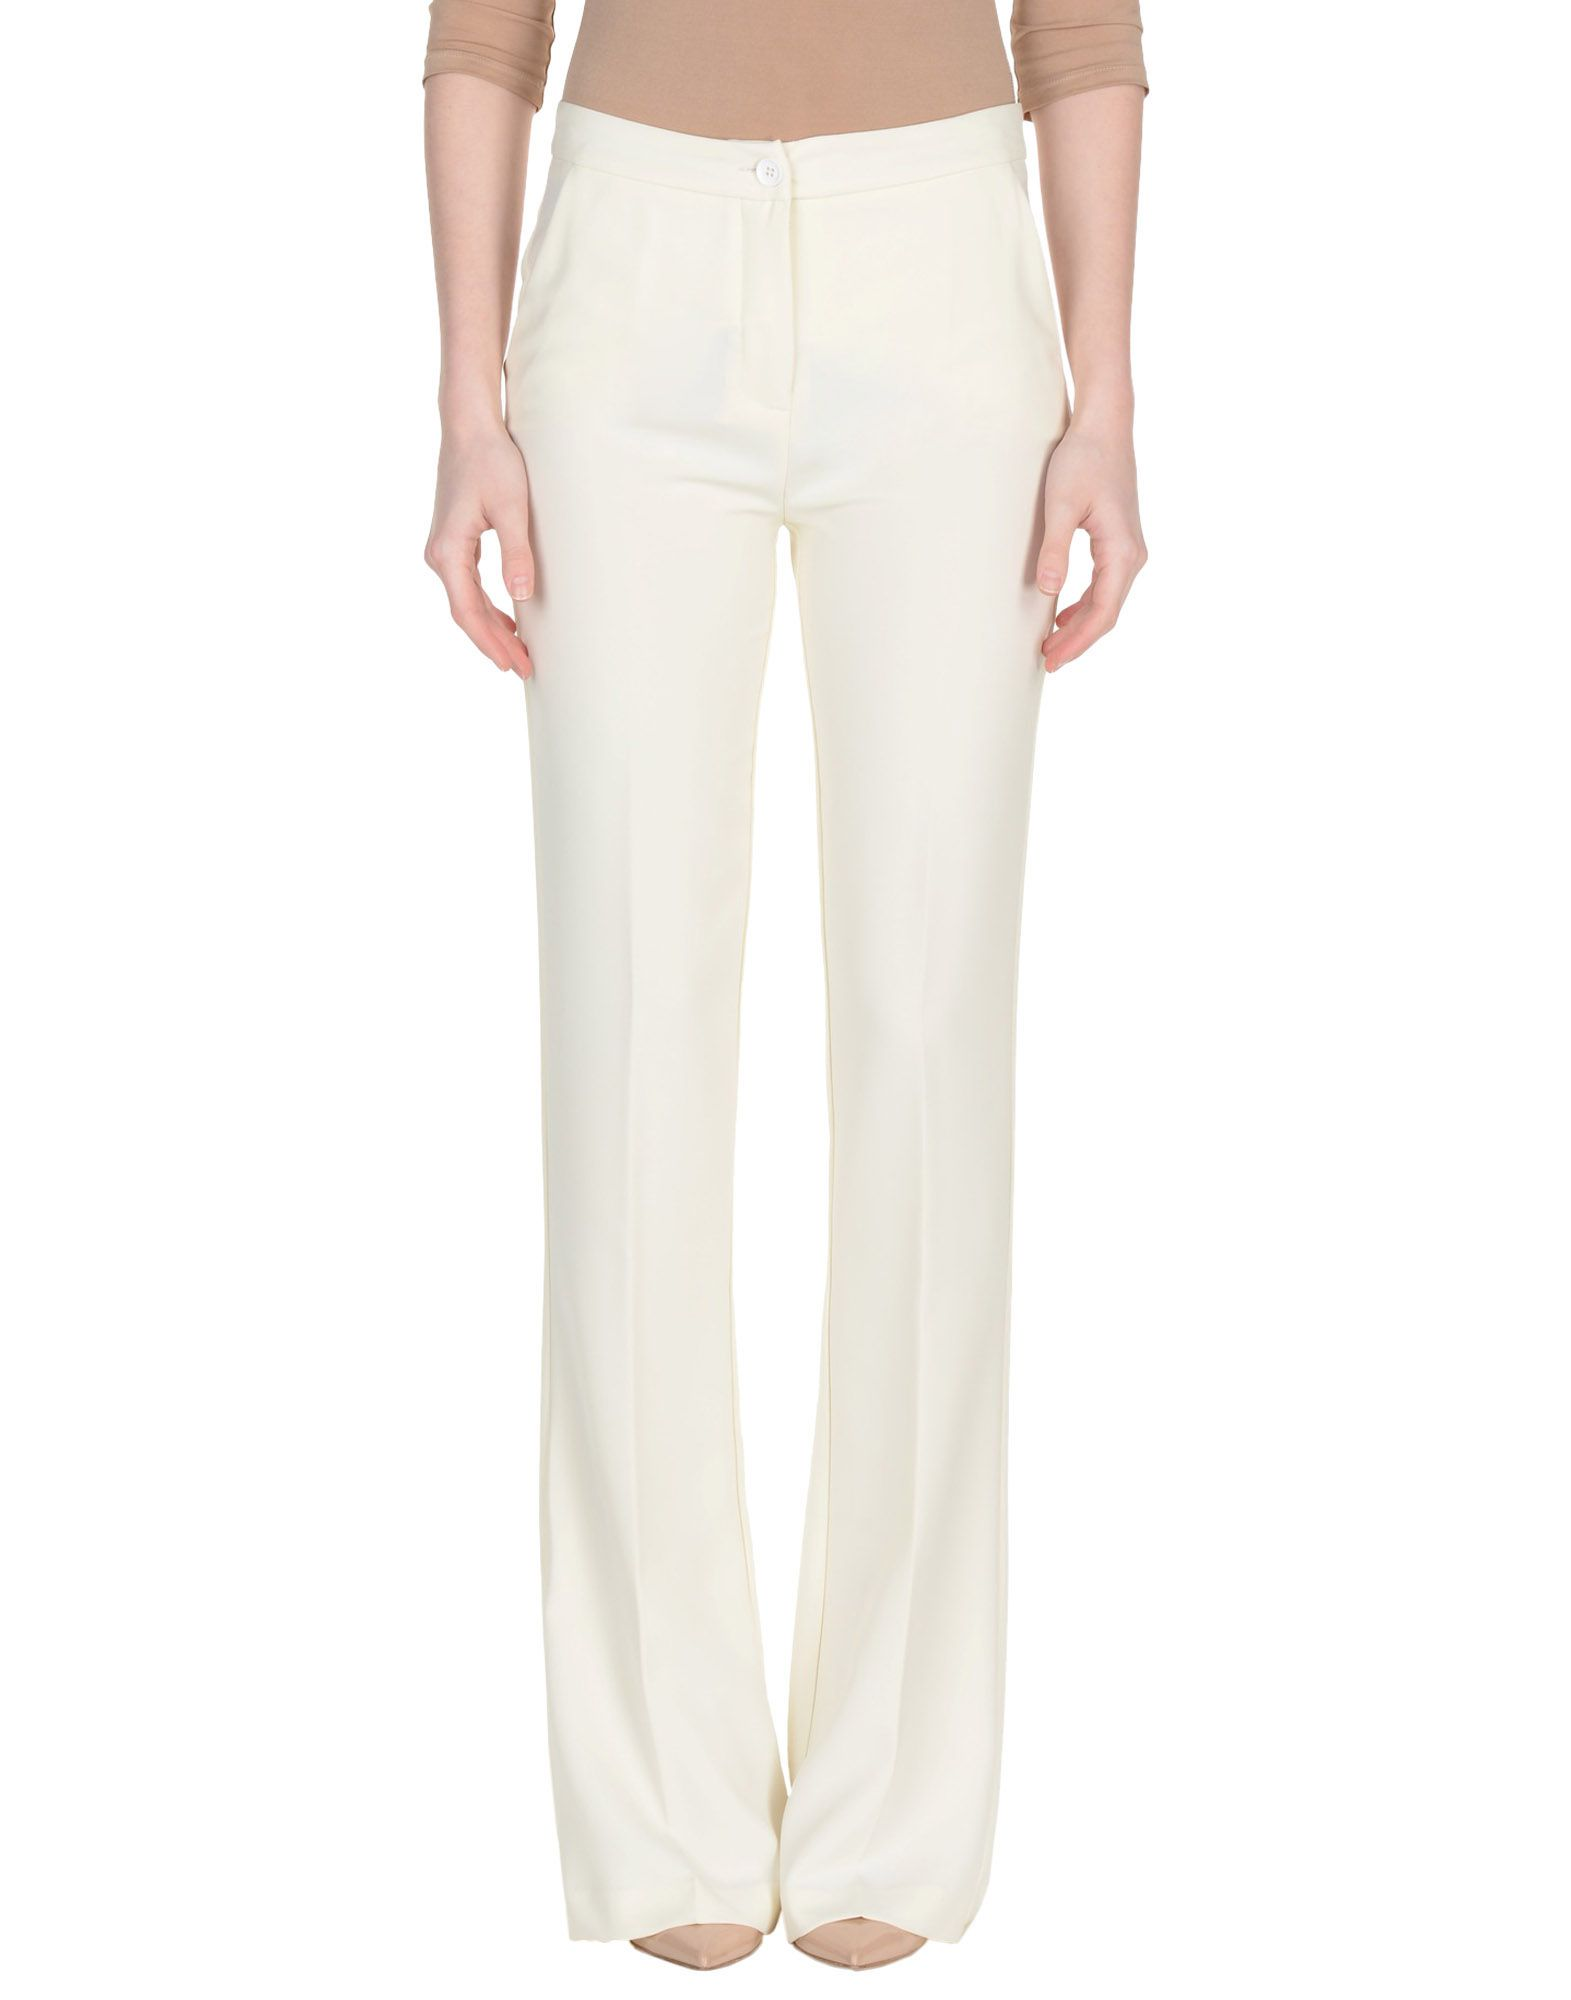 Pantalone Trussardi Jeans damen - 13129593GA